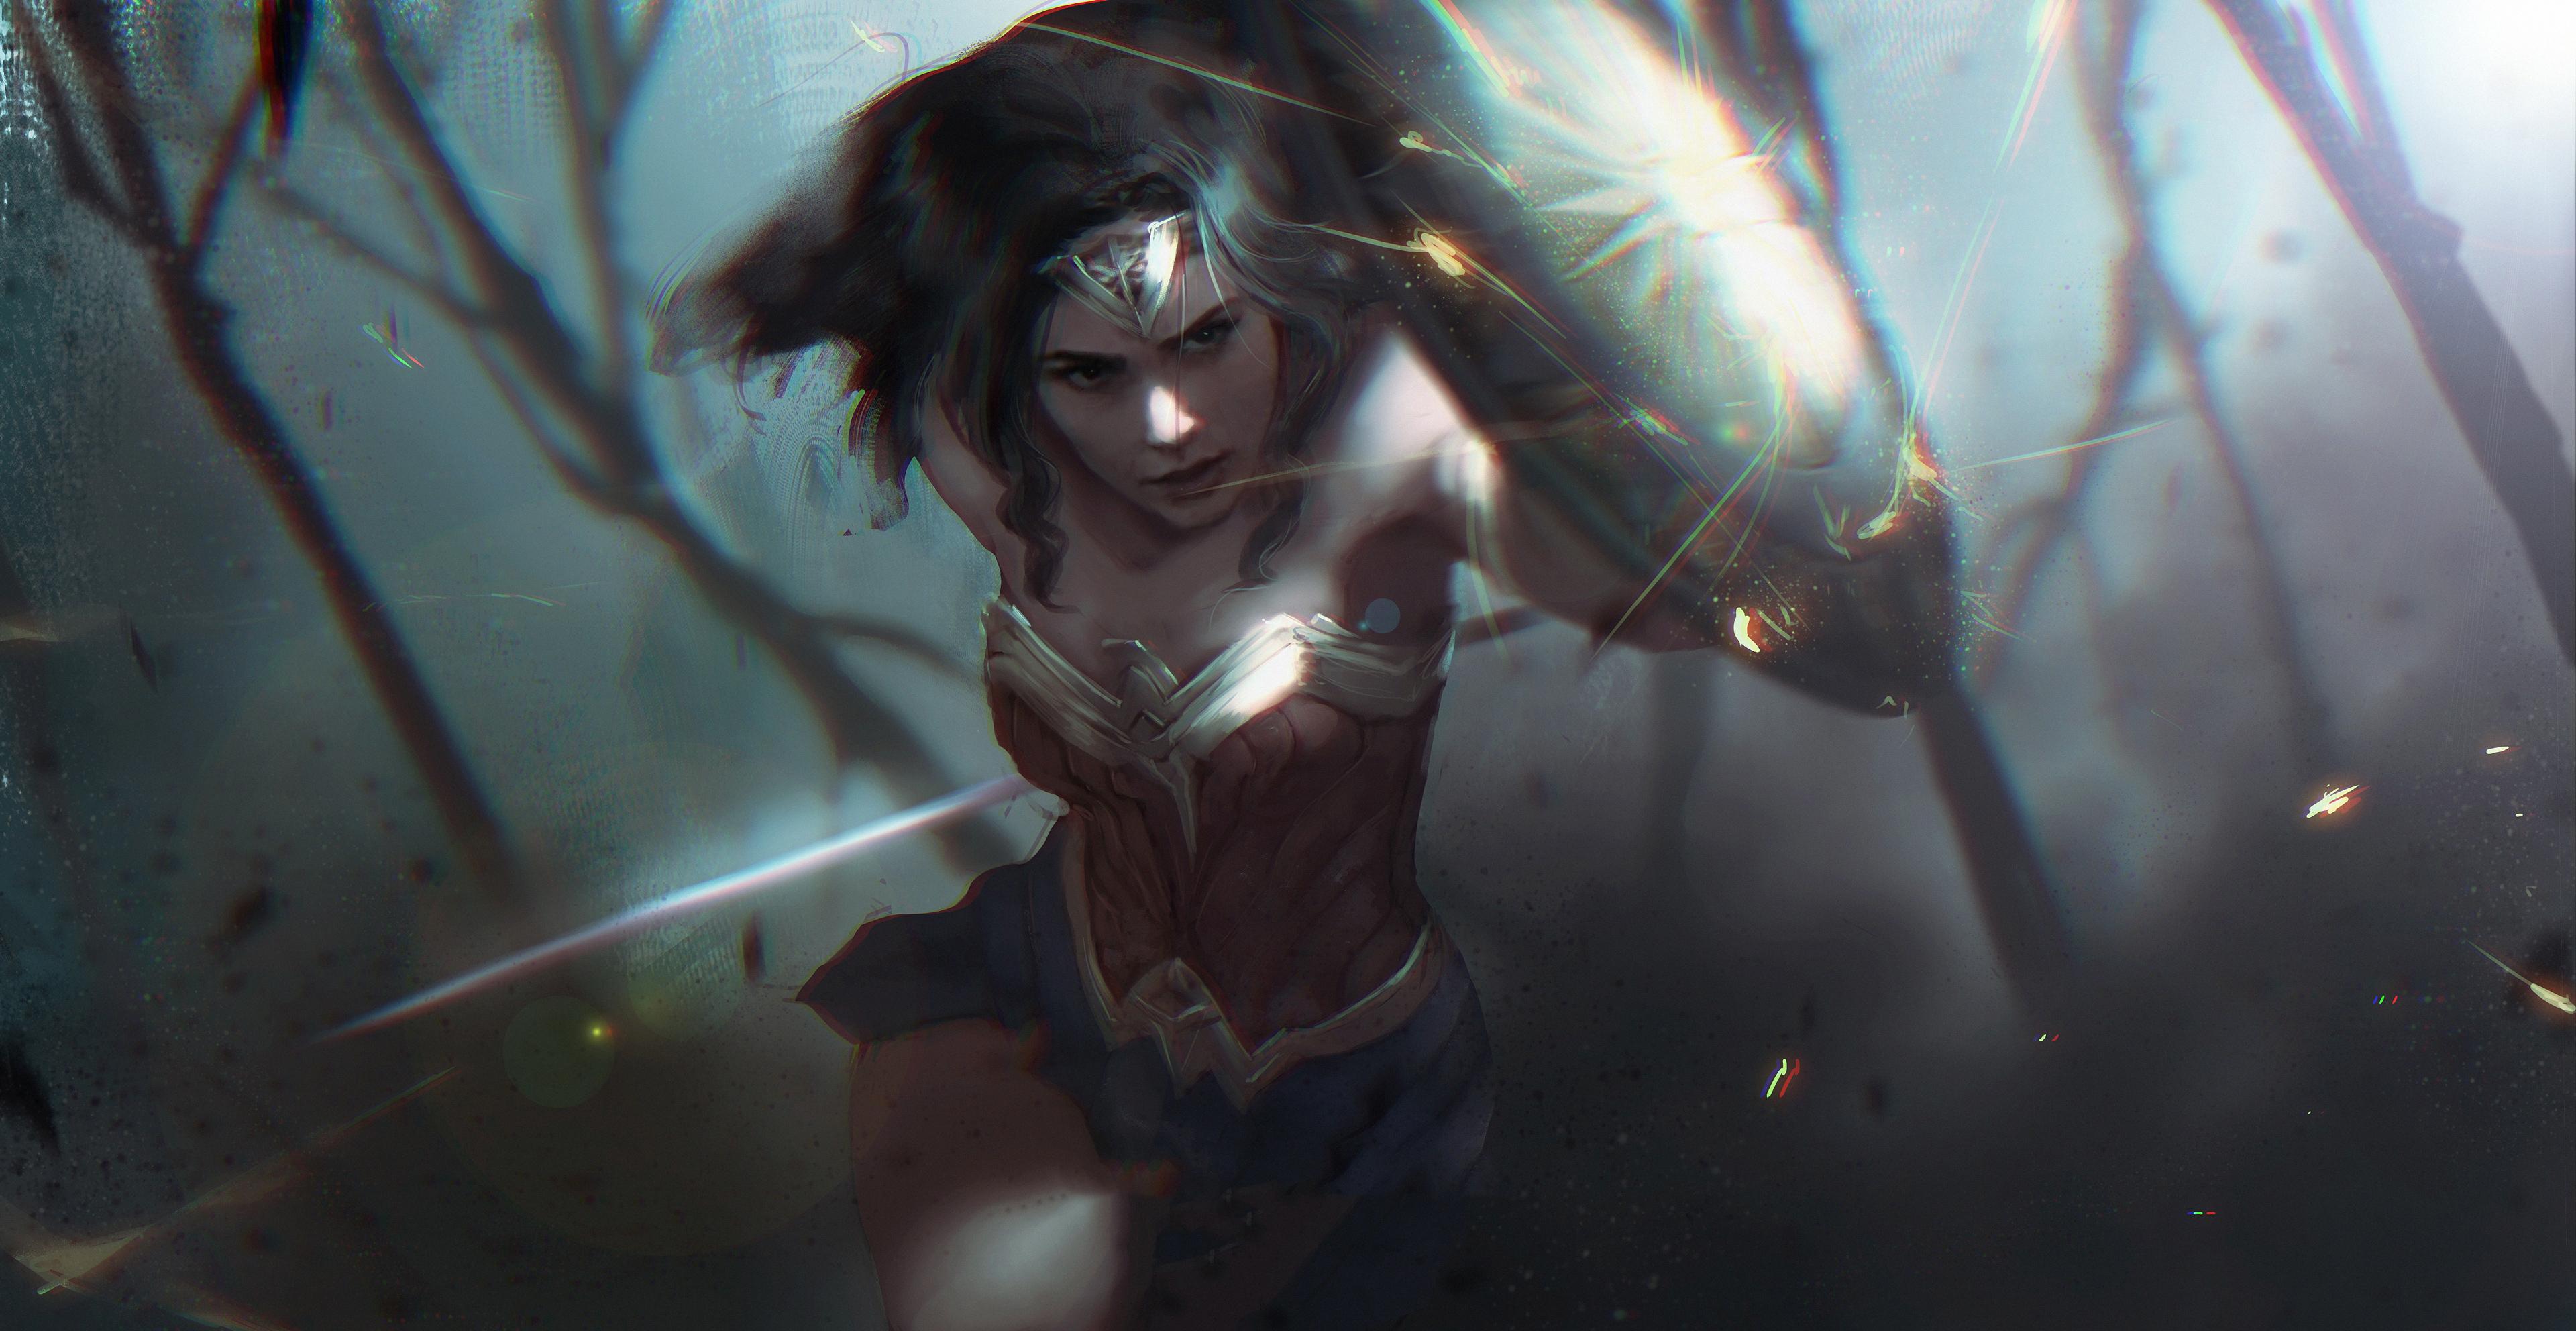 wonder woman with shield 1576097595 - Wonder Woman with shield - wonder woman wallpaper phone hd 4k, Wonder Woman wallpaper 4k hd, wonder woman art wallpaper 4k, wonder woman 4k wallpaper